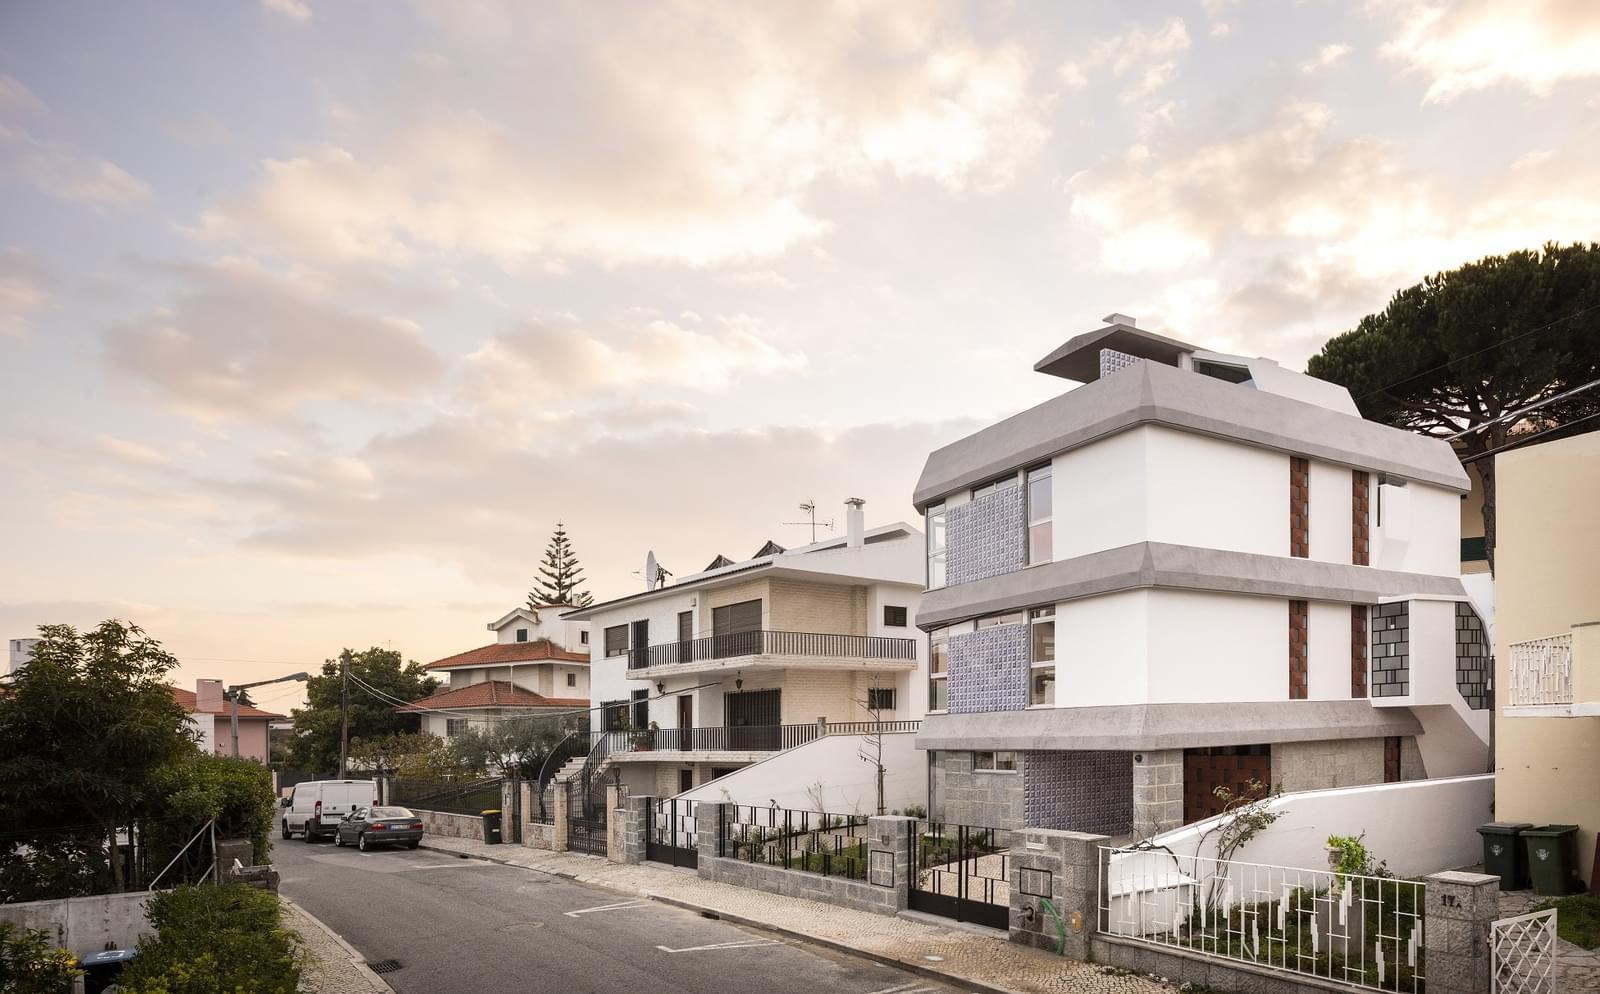 5 bedroom villa with parking